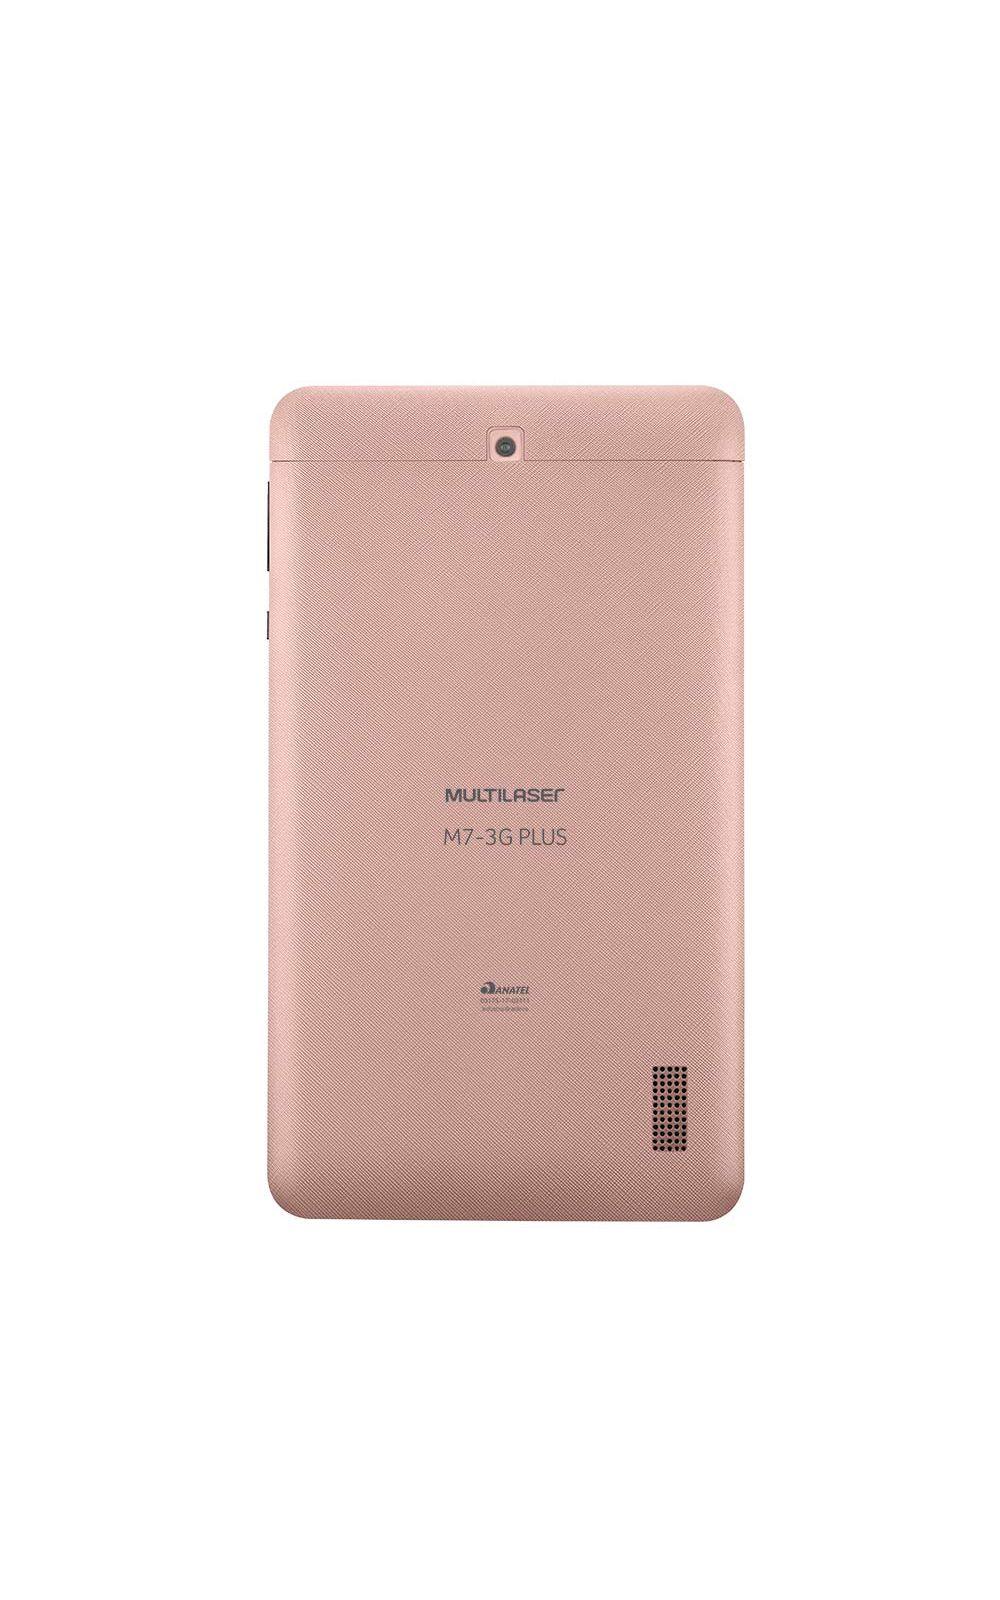 Foto 4 - Tablet Multilaser M7 3G Plus Dual Chip Quad Core 1 GB de Ram Memória 16 GB Tela 7 Polegadas Rosa - NB305